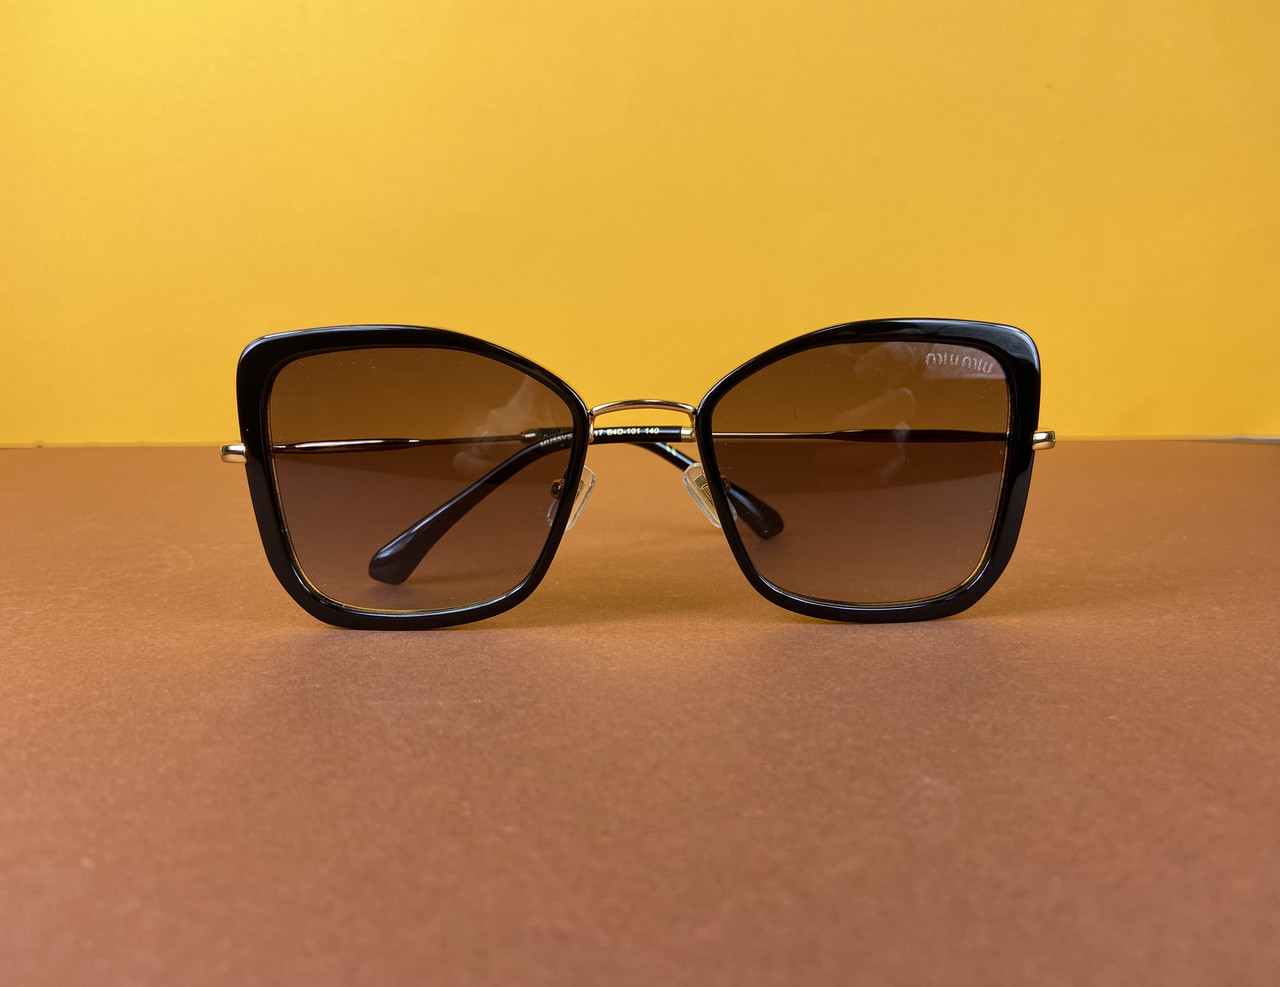 Очки Miu Miu солнцезащитные (Миу Миу) 106-35